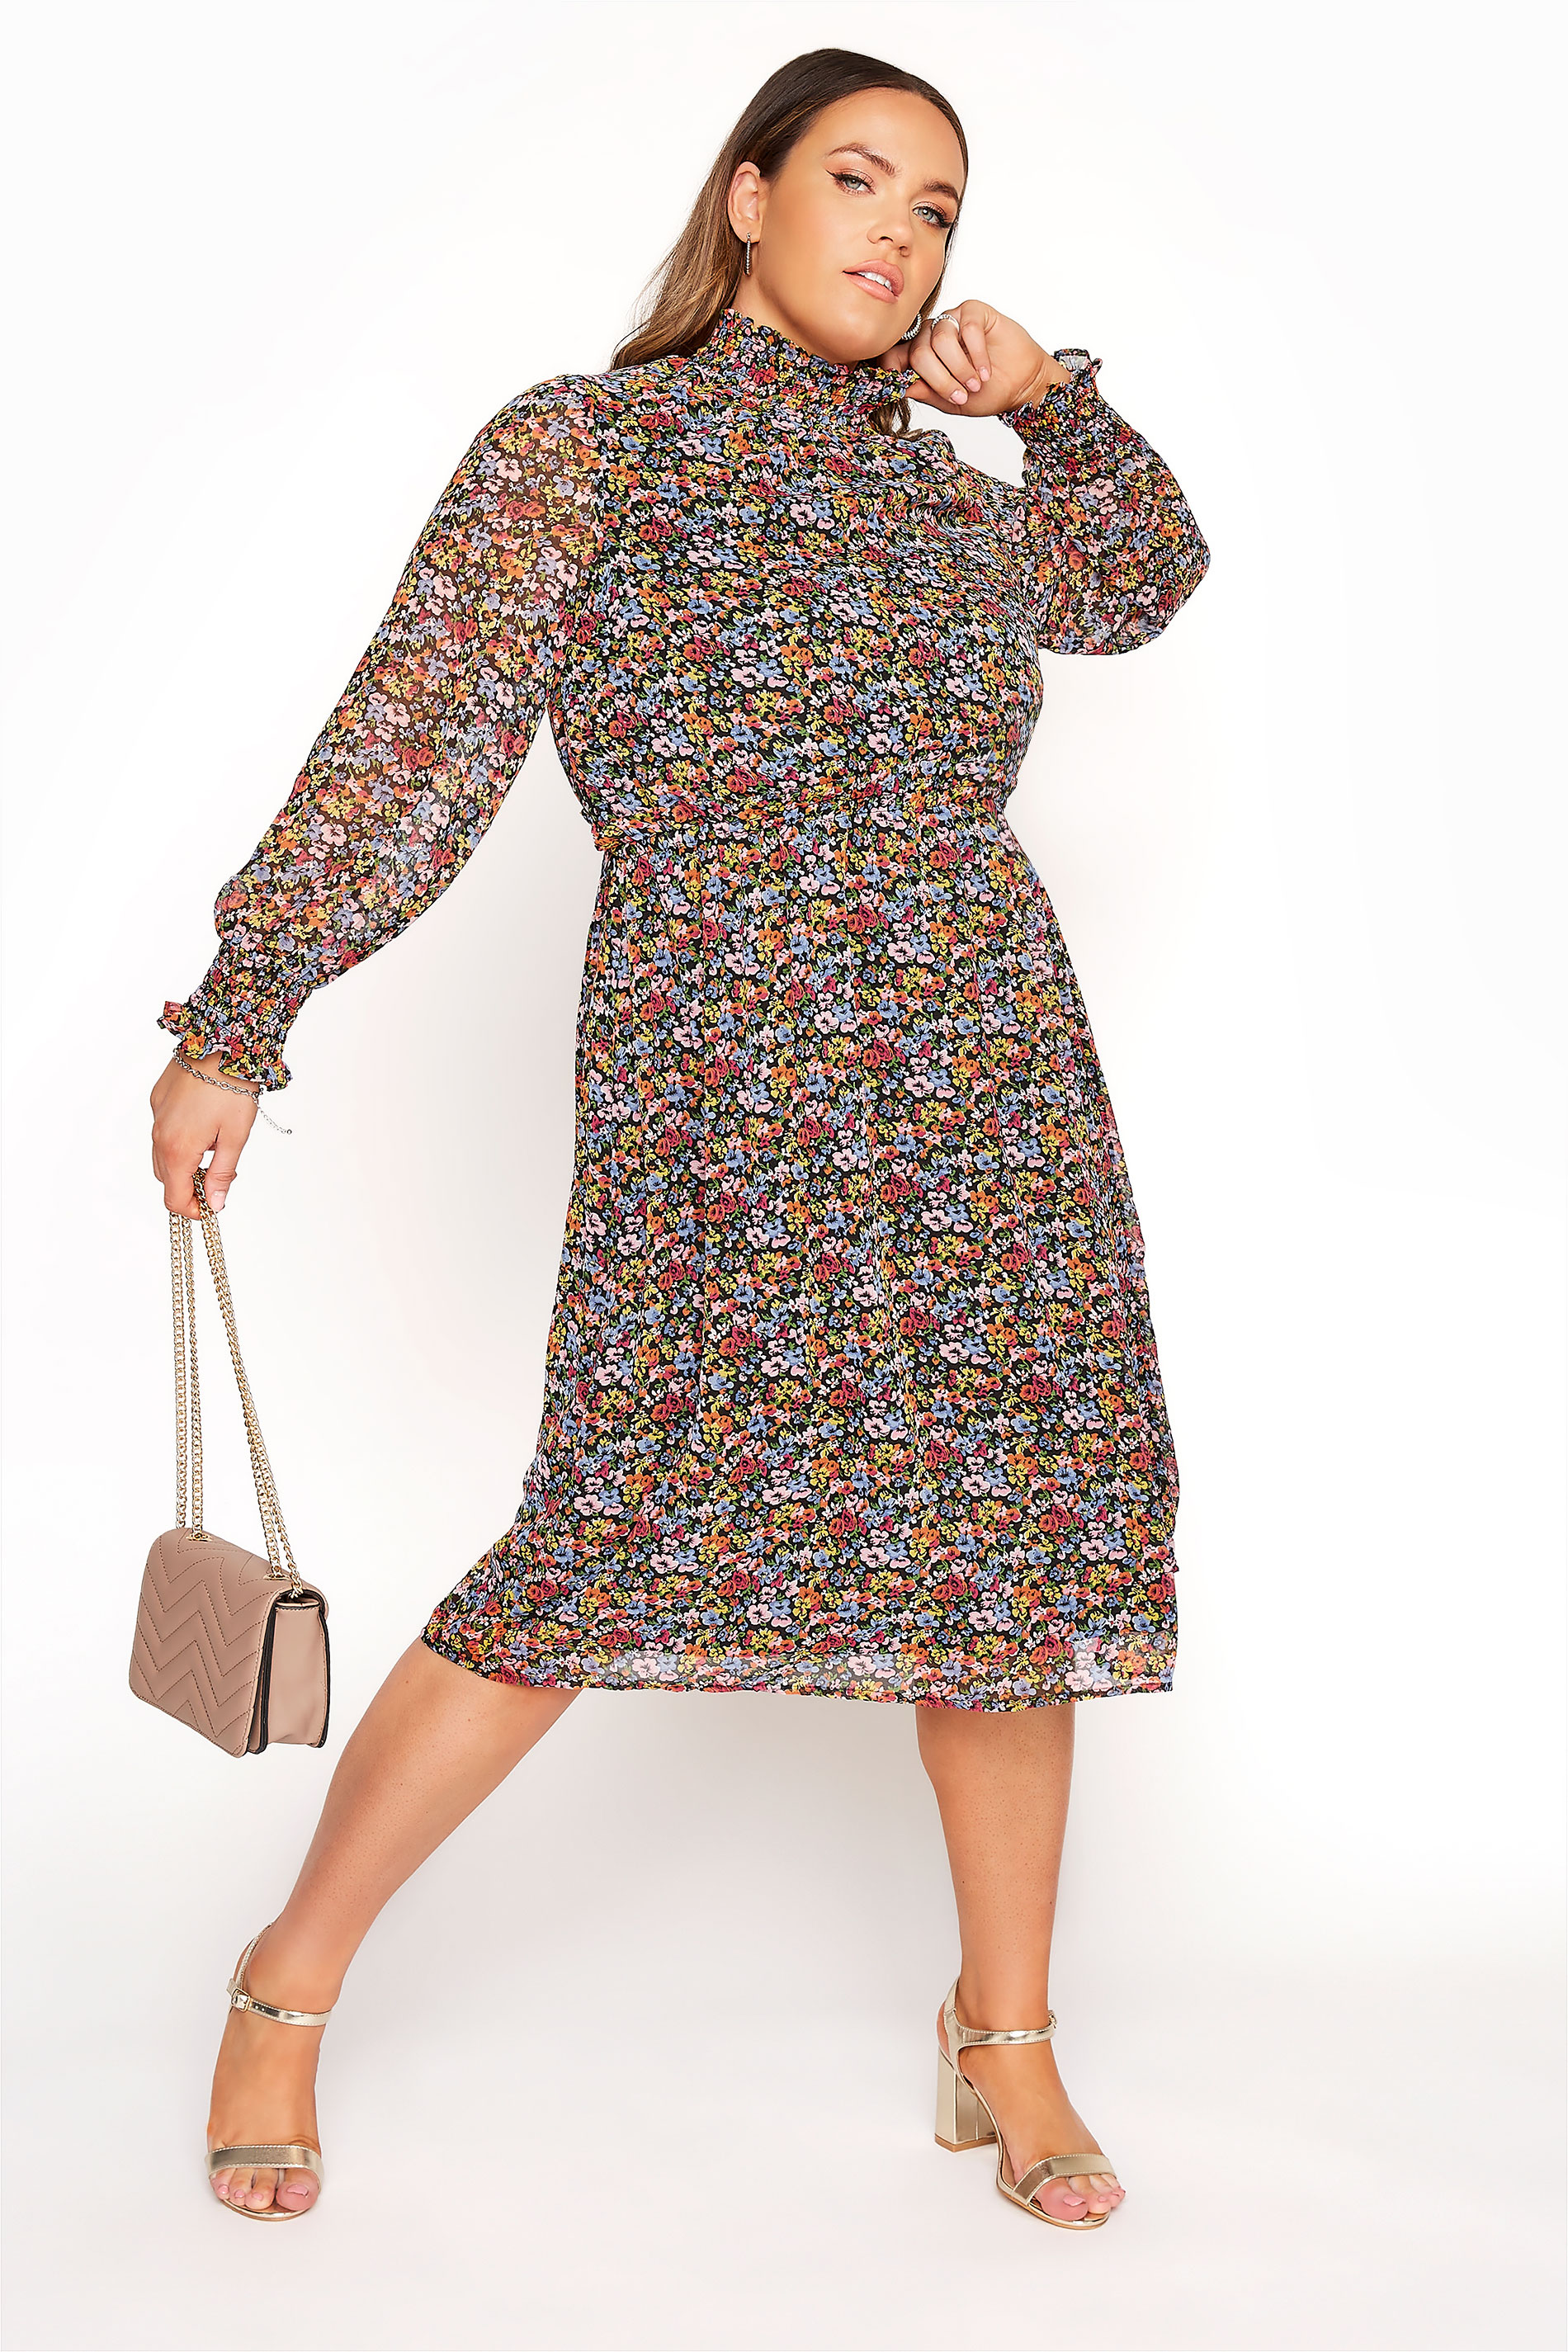 YOURS LONDON - Midi-jurk van chiffon met bloemetjesprint in multikleur